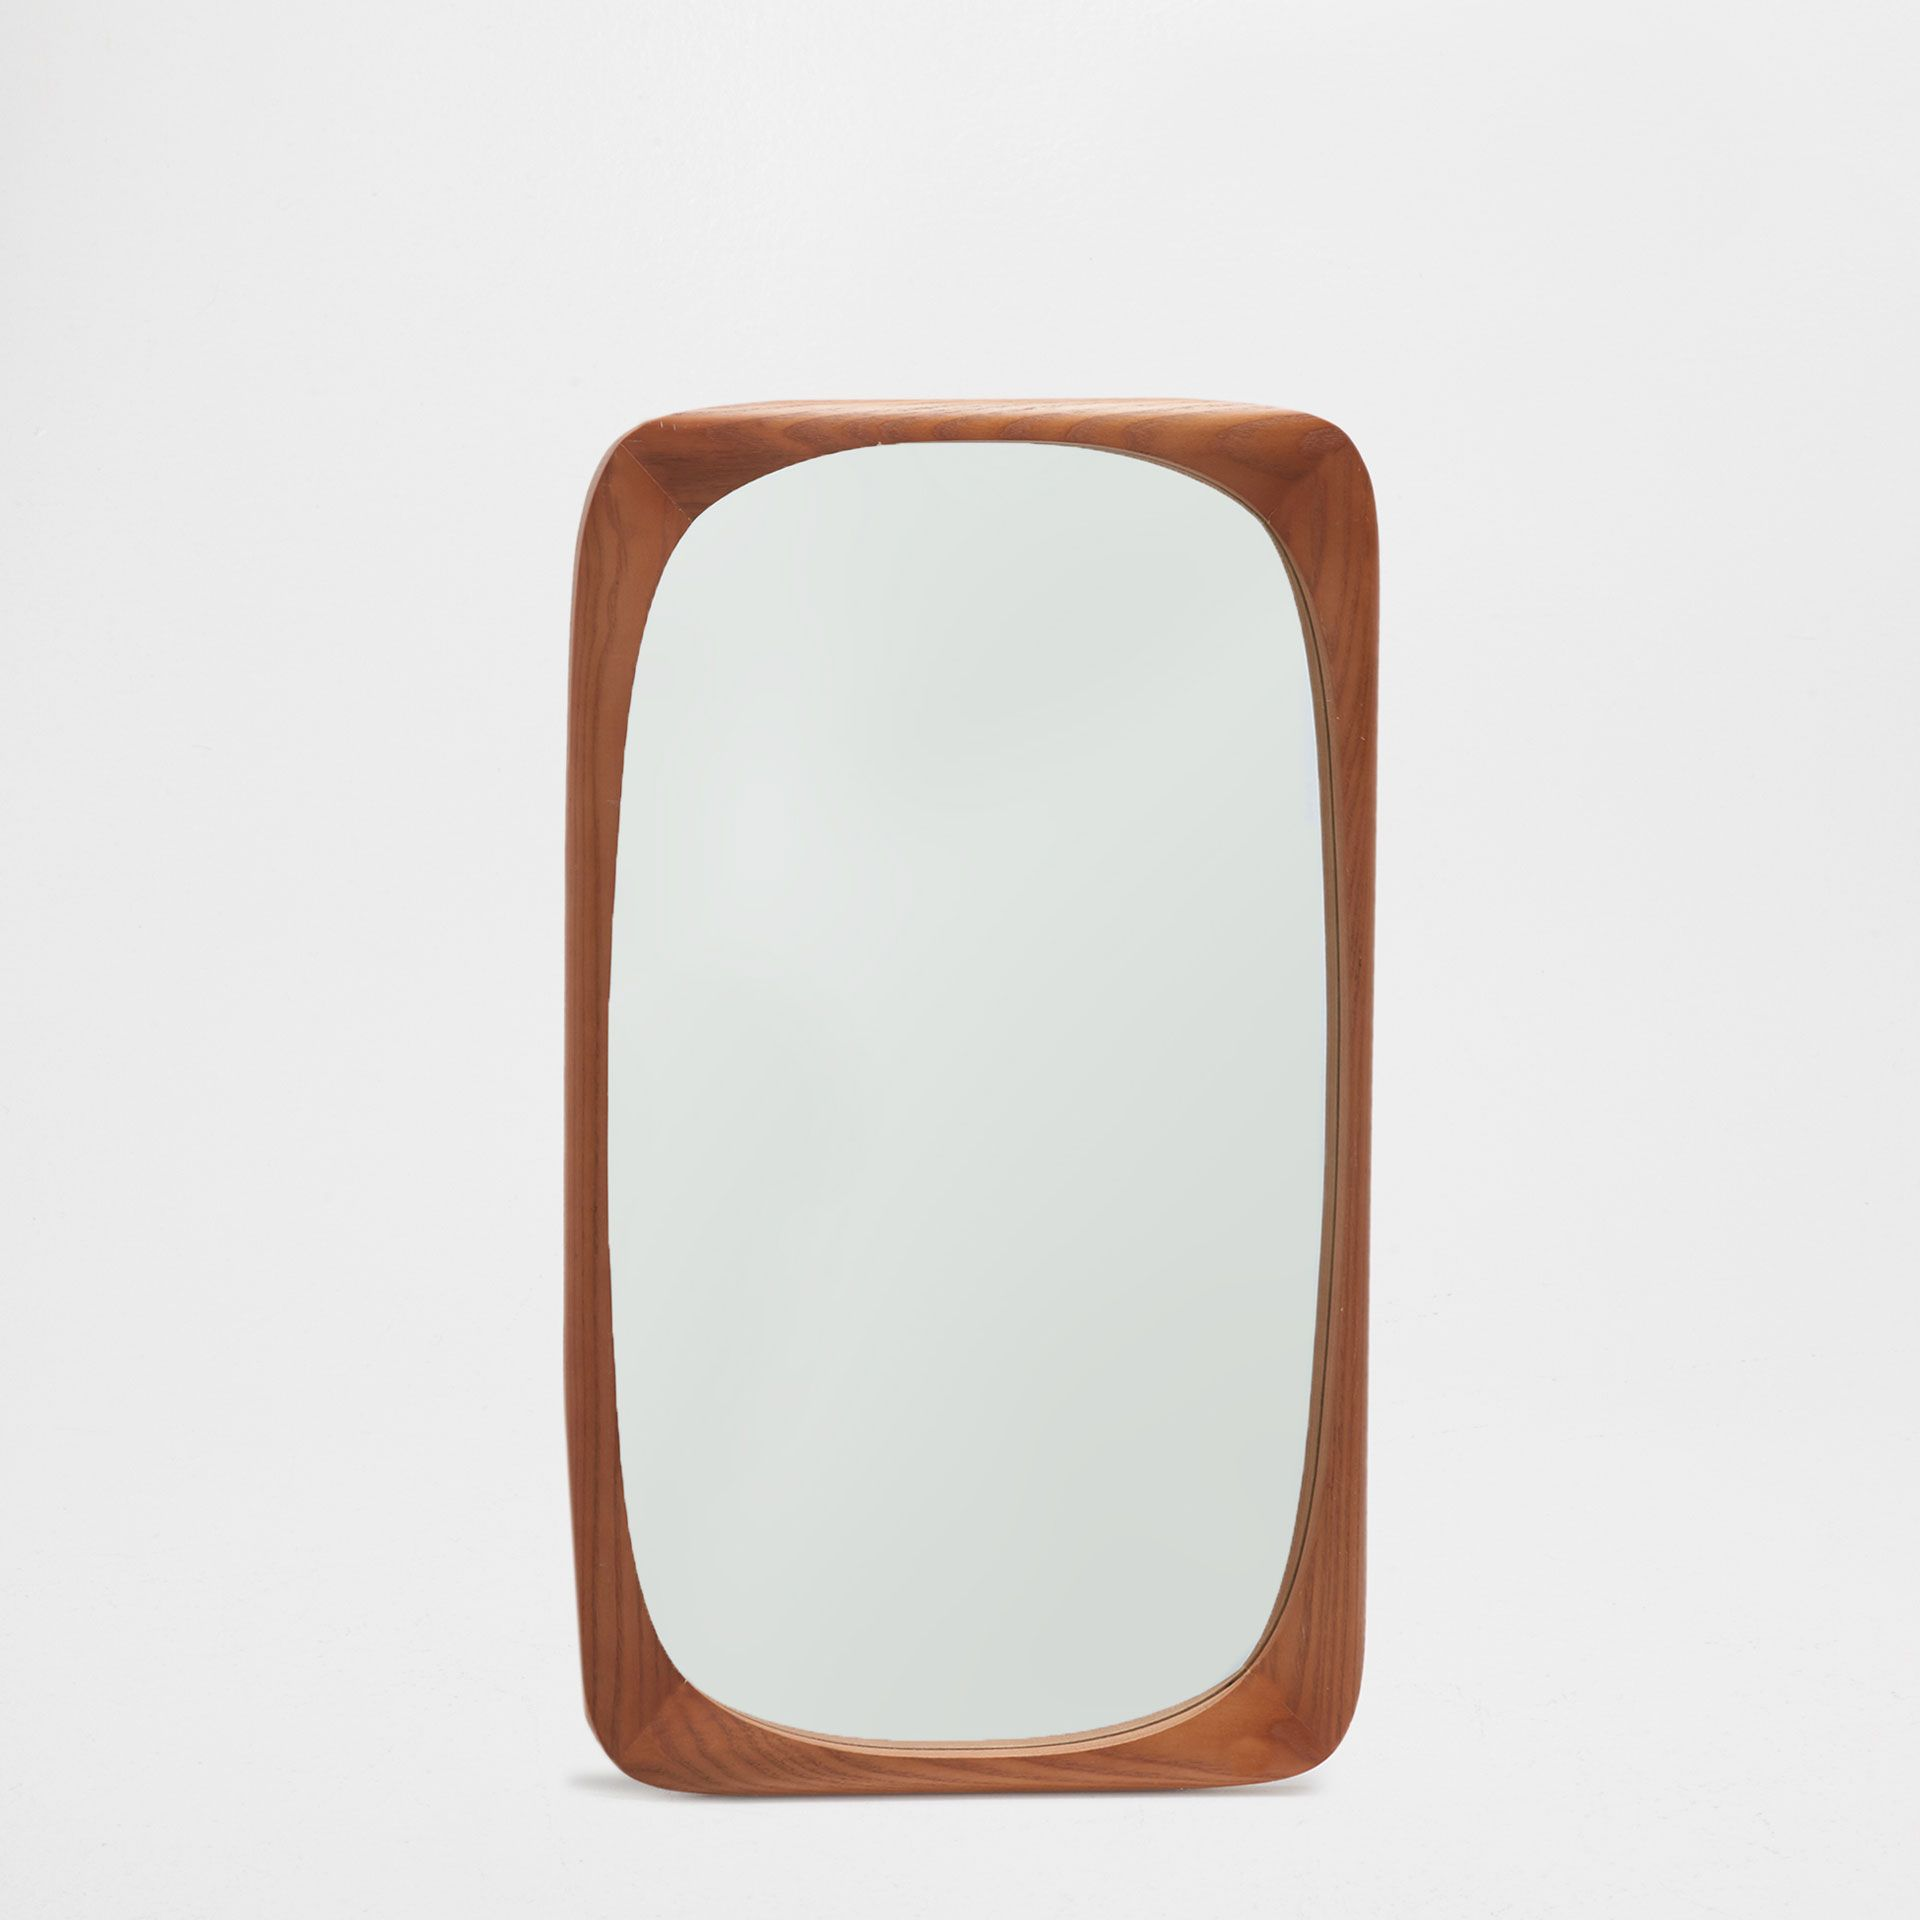 espejo rectangular irregular color natural para el sal n. Black Bedroom Furniture Sets. Home Design Ideas